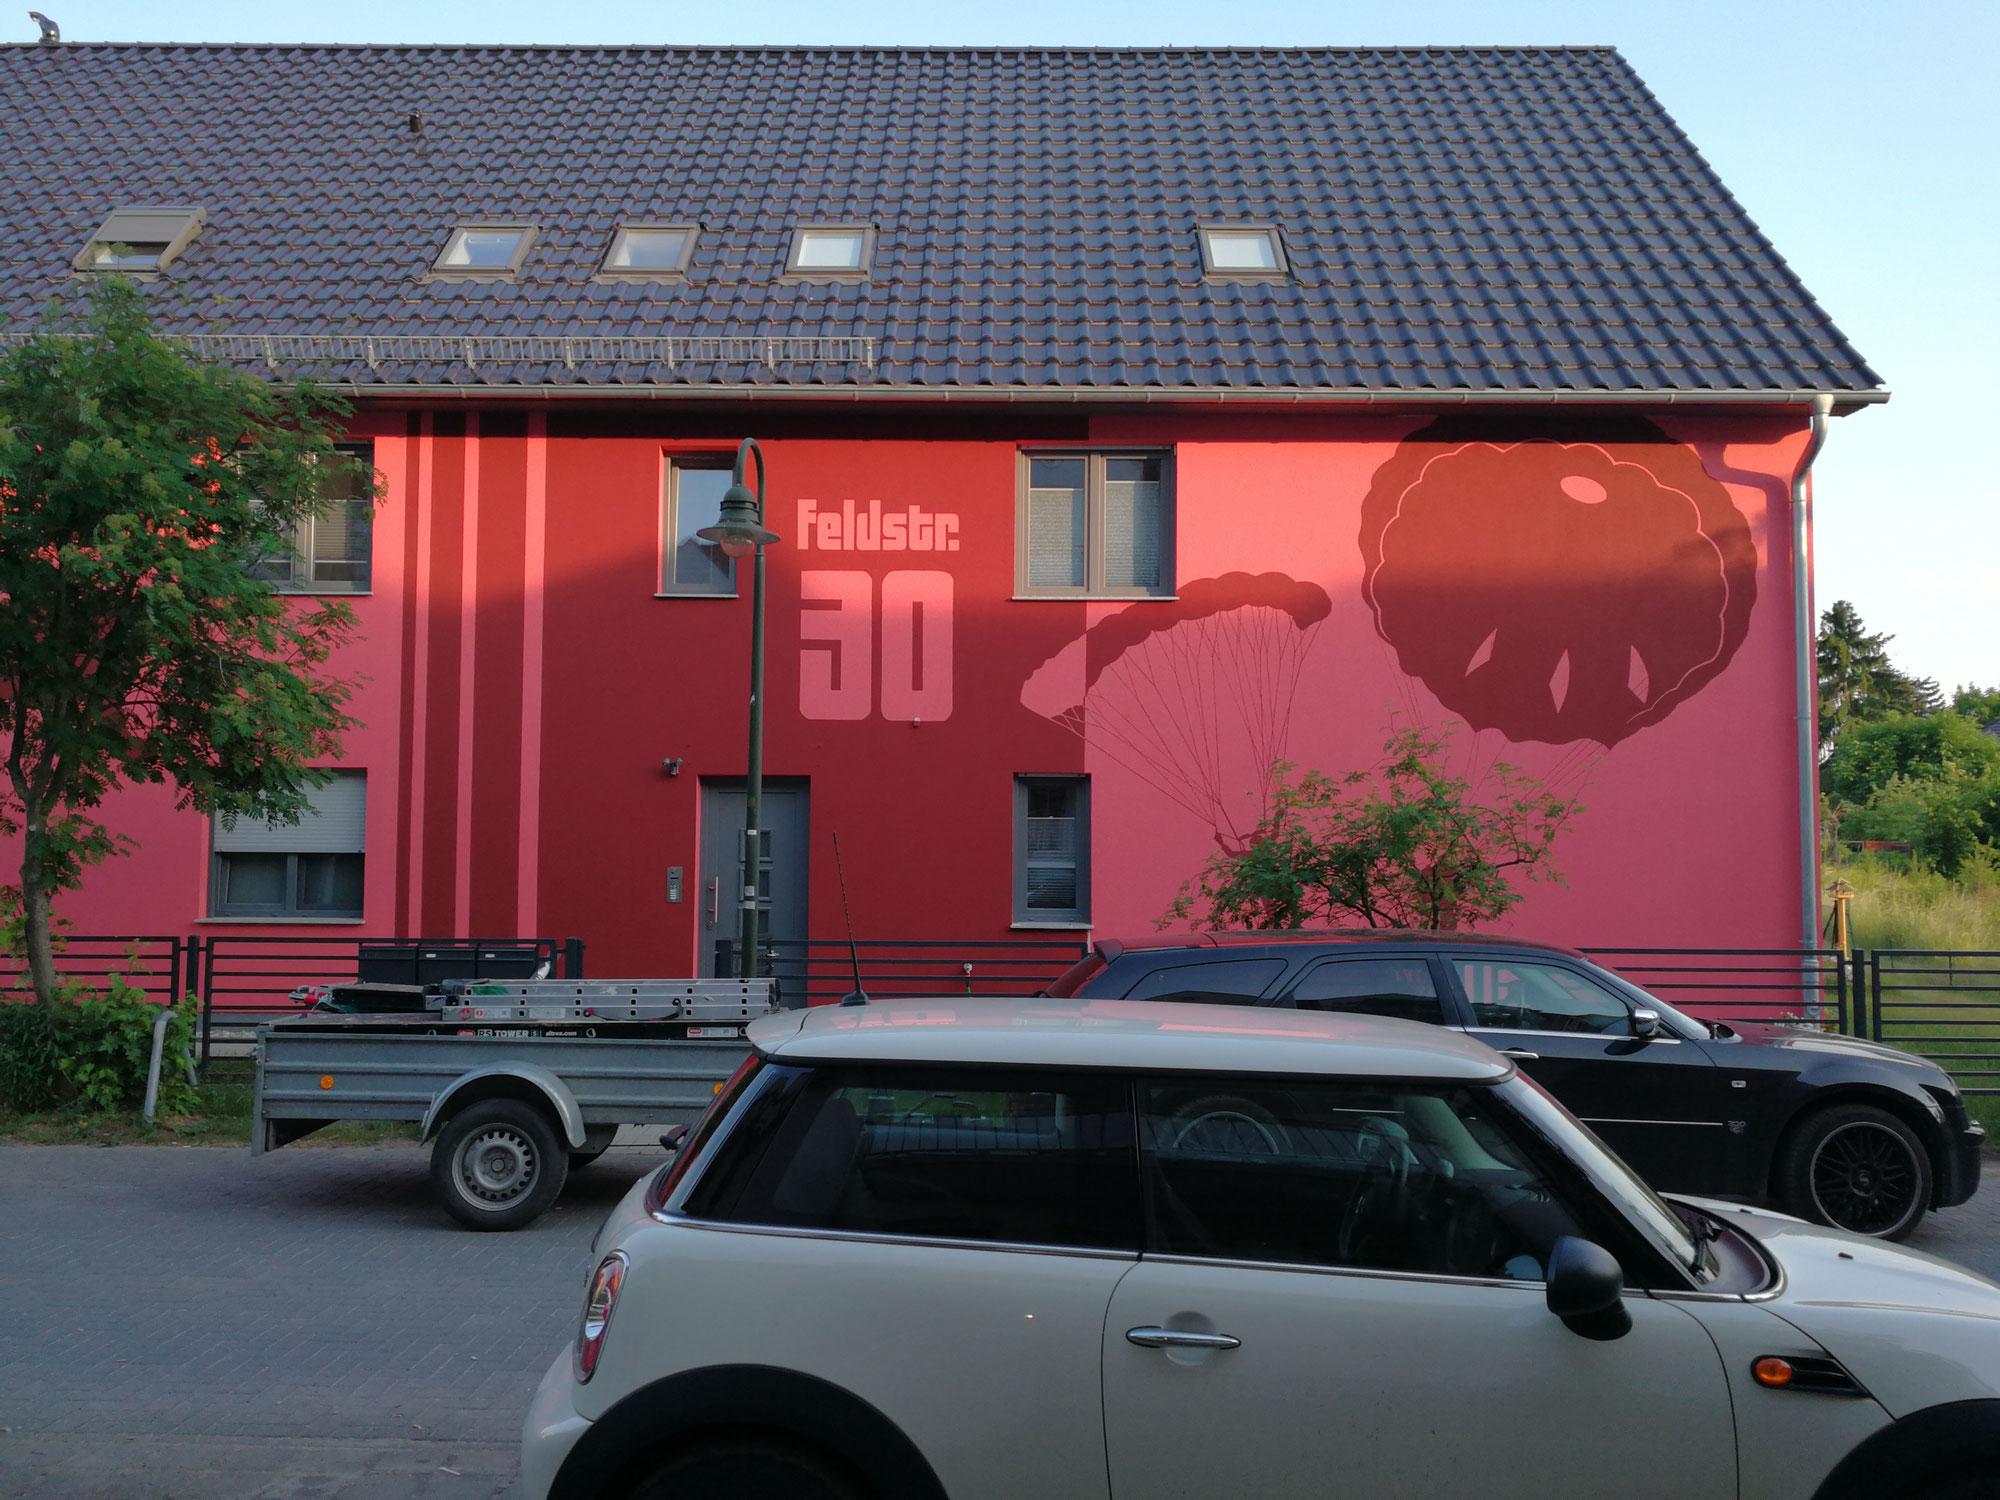 Fassadengestaltung Berlin Petershagen Graffiti